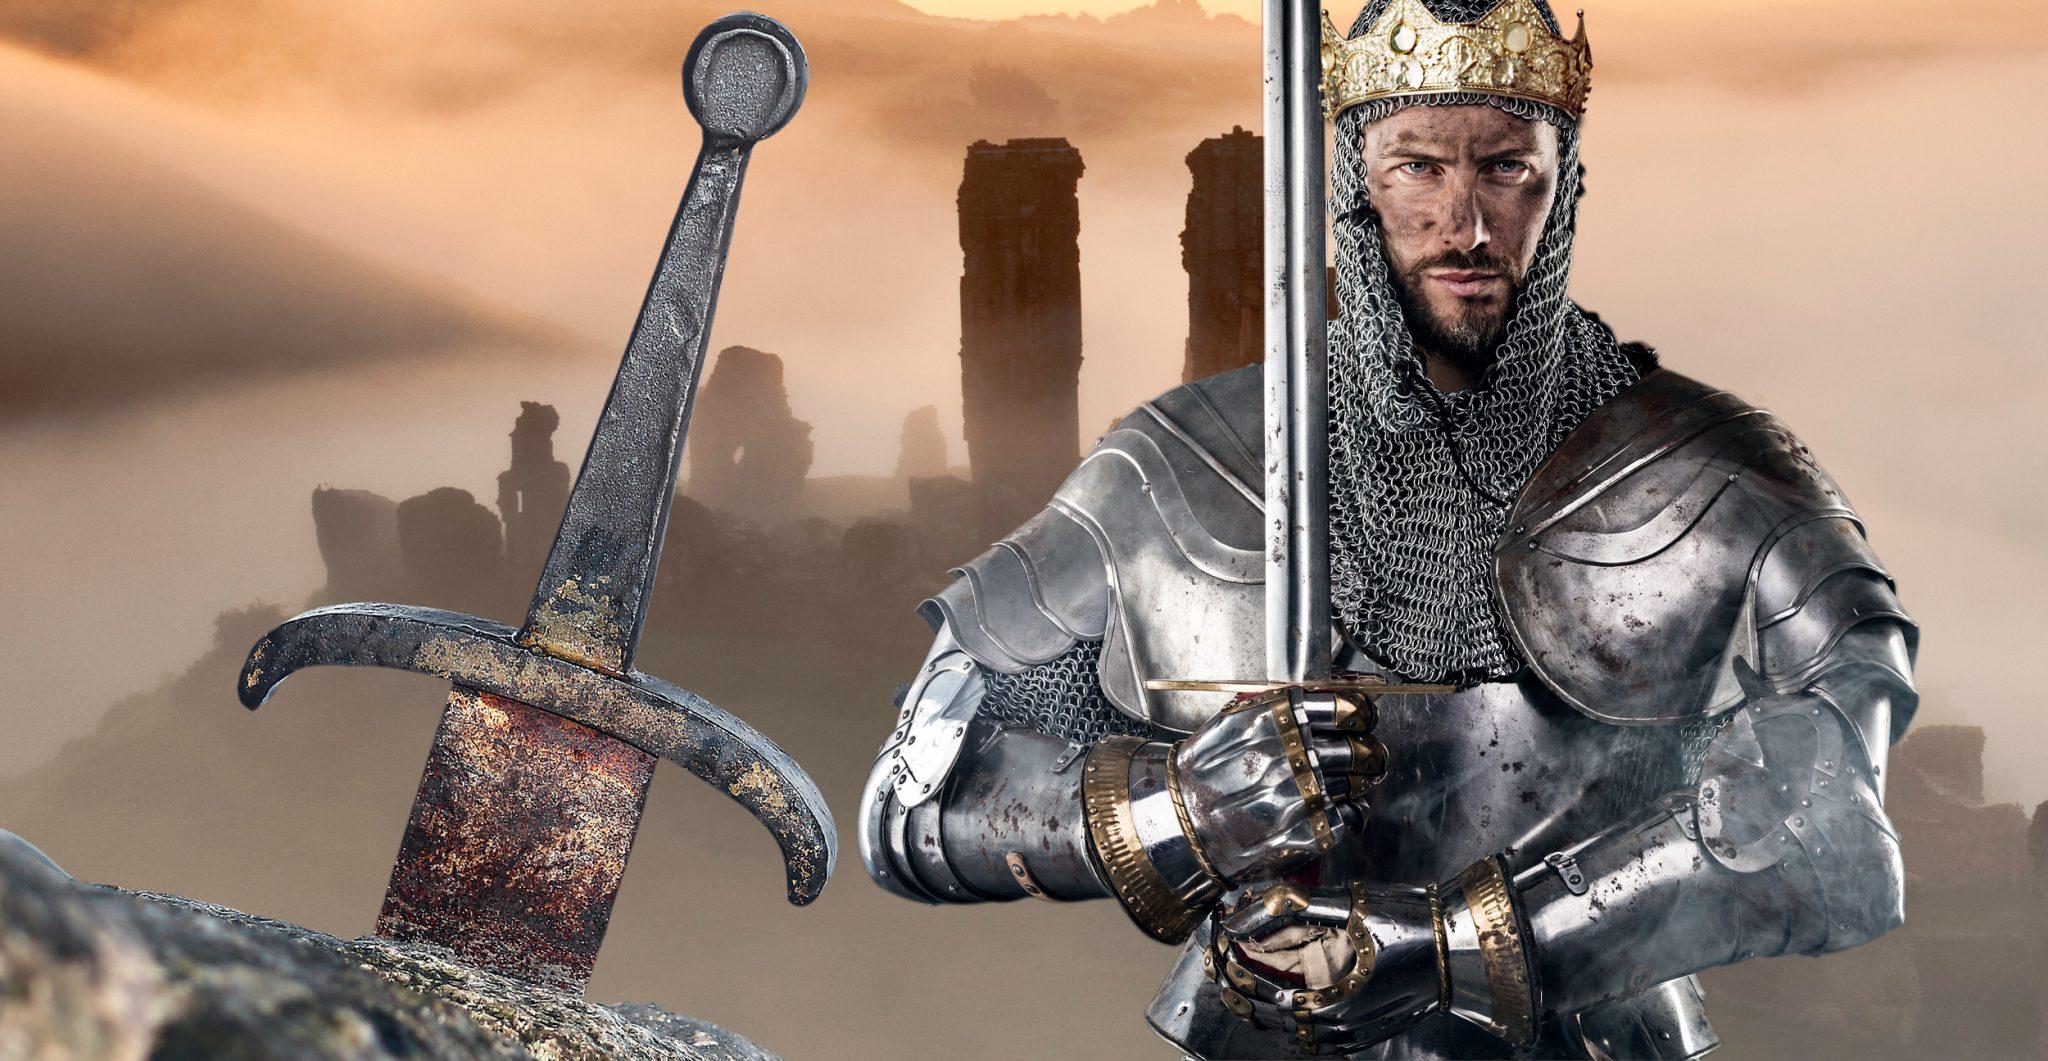 Arthur's legendary sword Excalibur